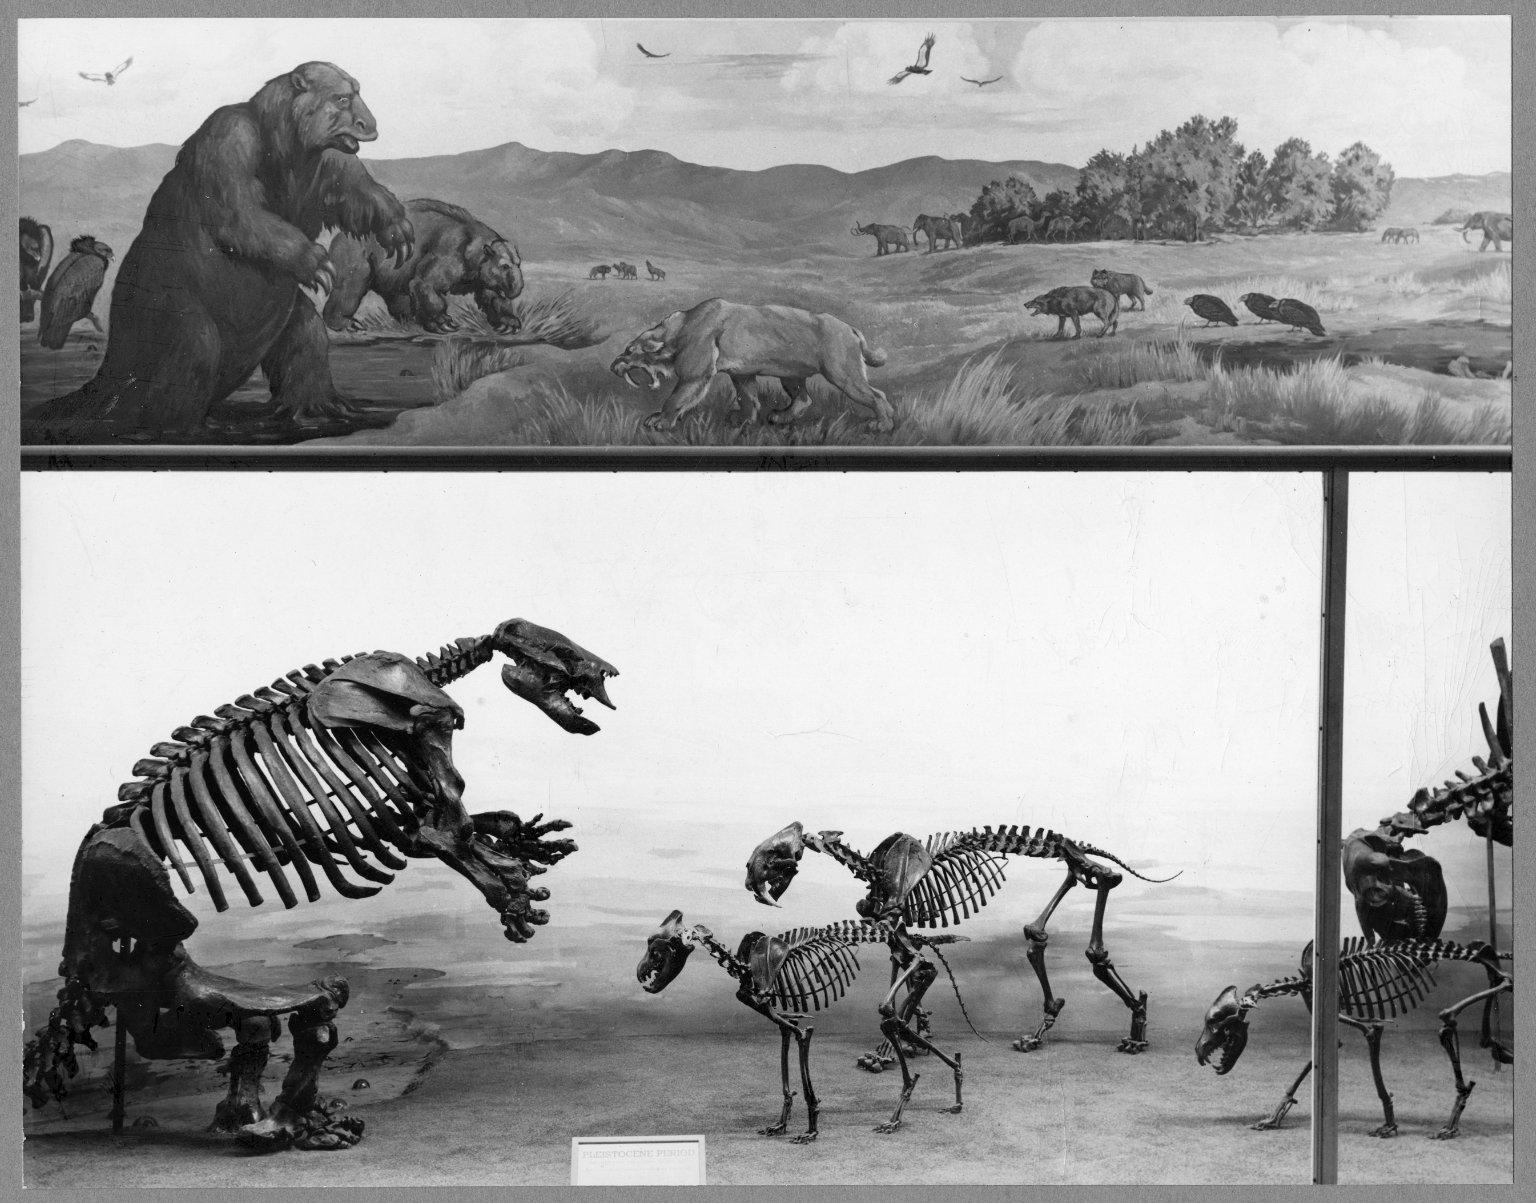 Articulated skeletons in Rancho La Brea exhibit, left side.